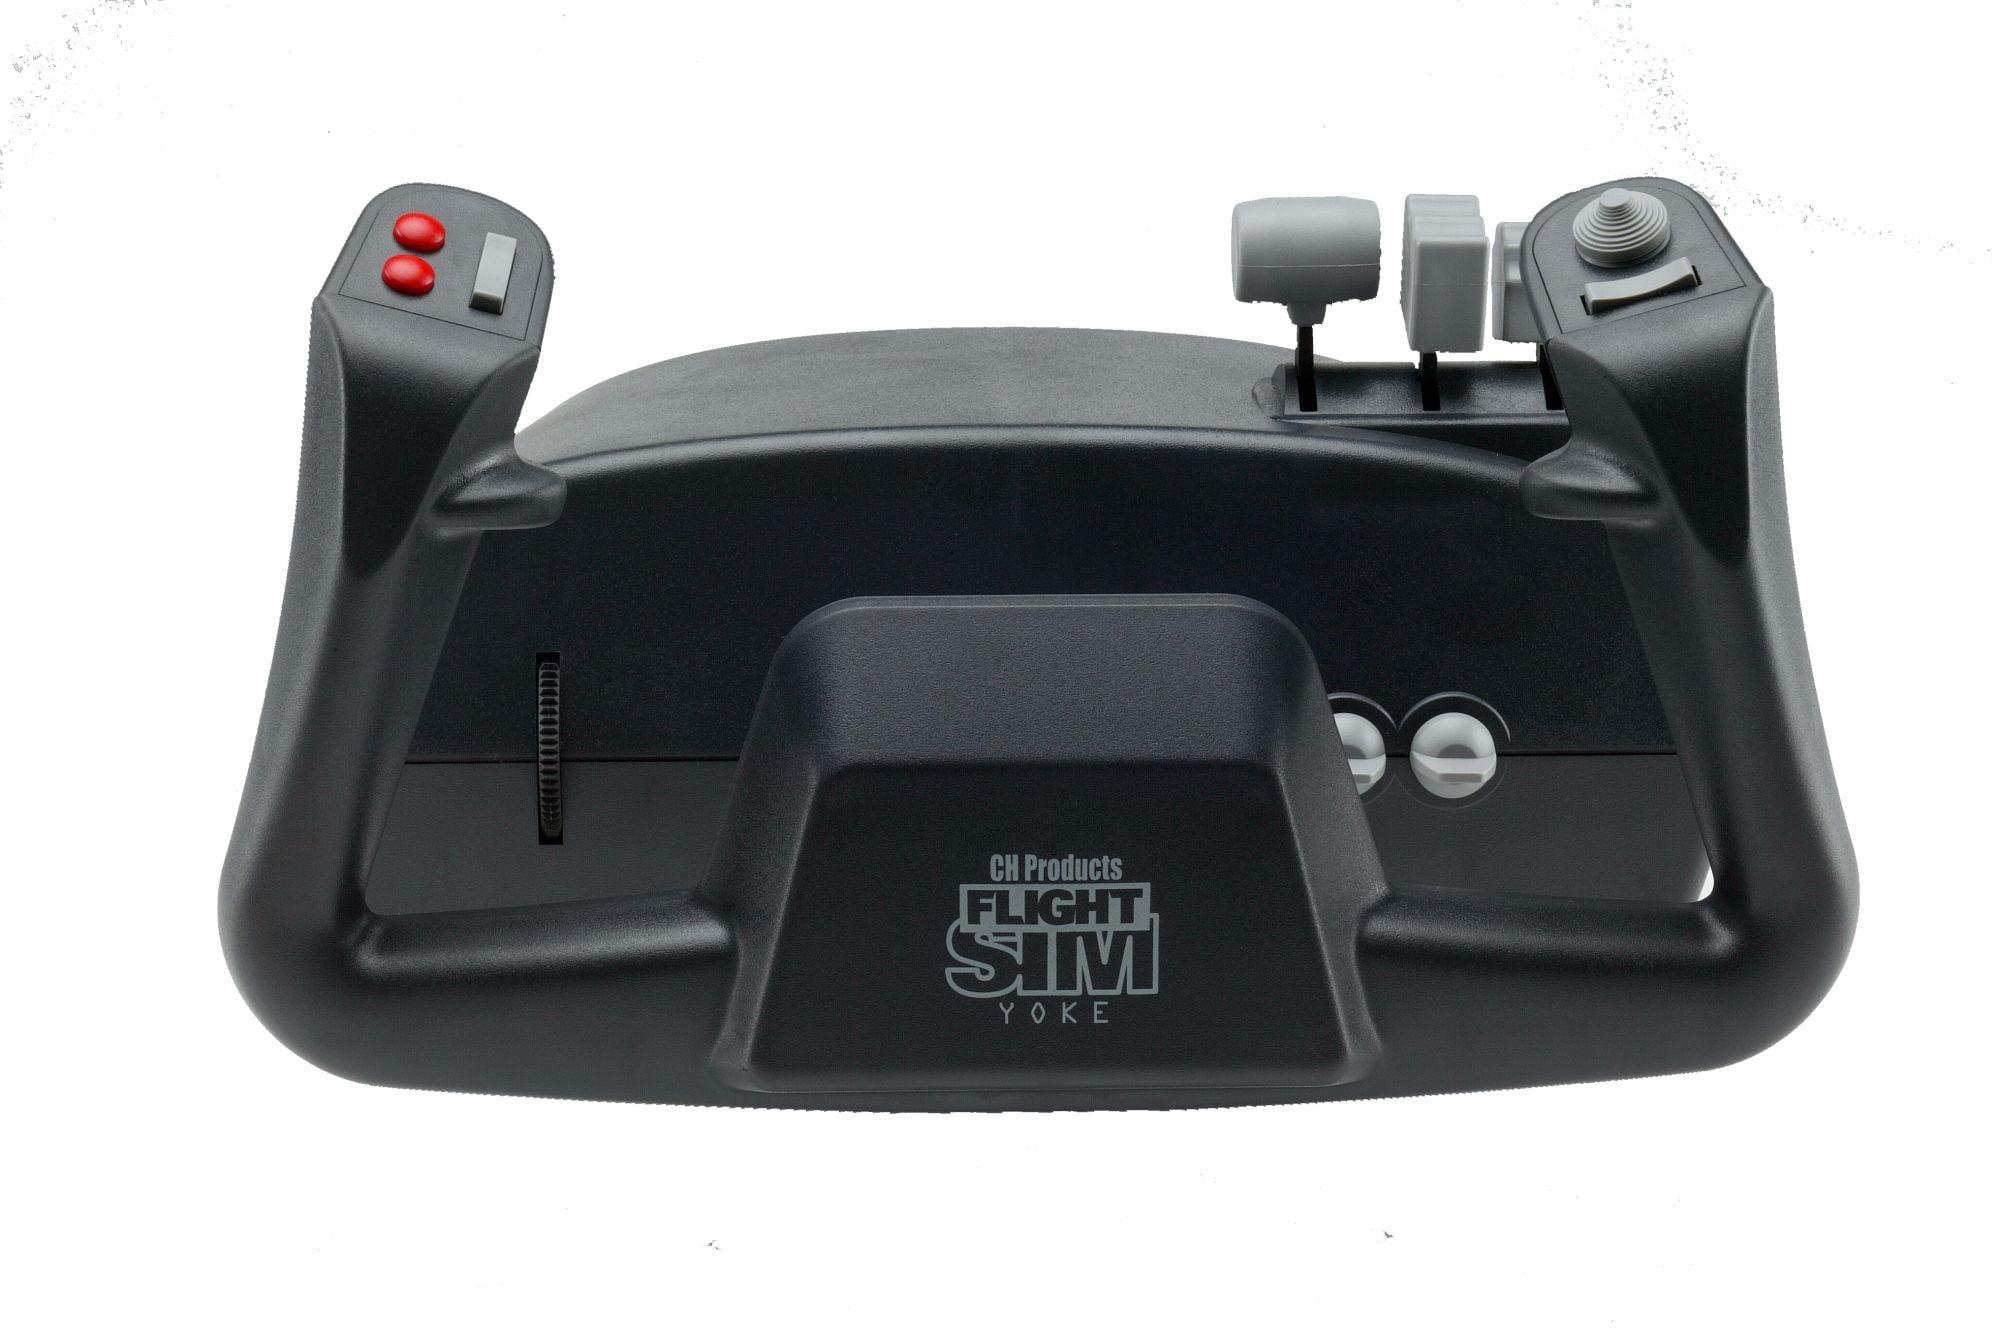 CH PRODUCTS YOKE USB krmilo za simulator letenja